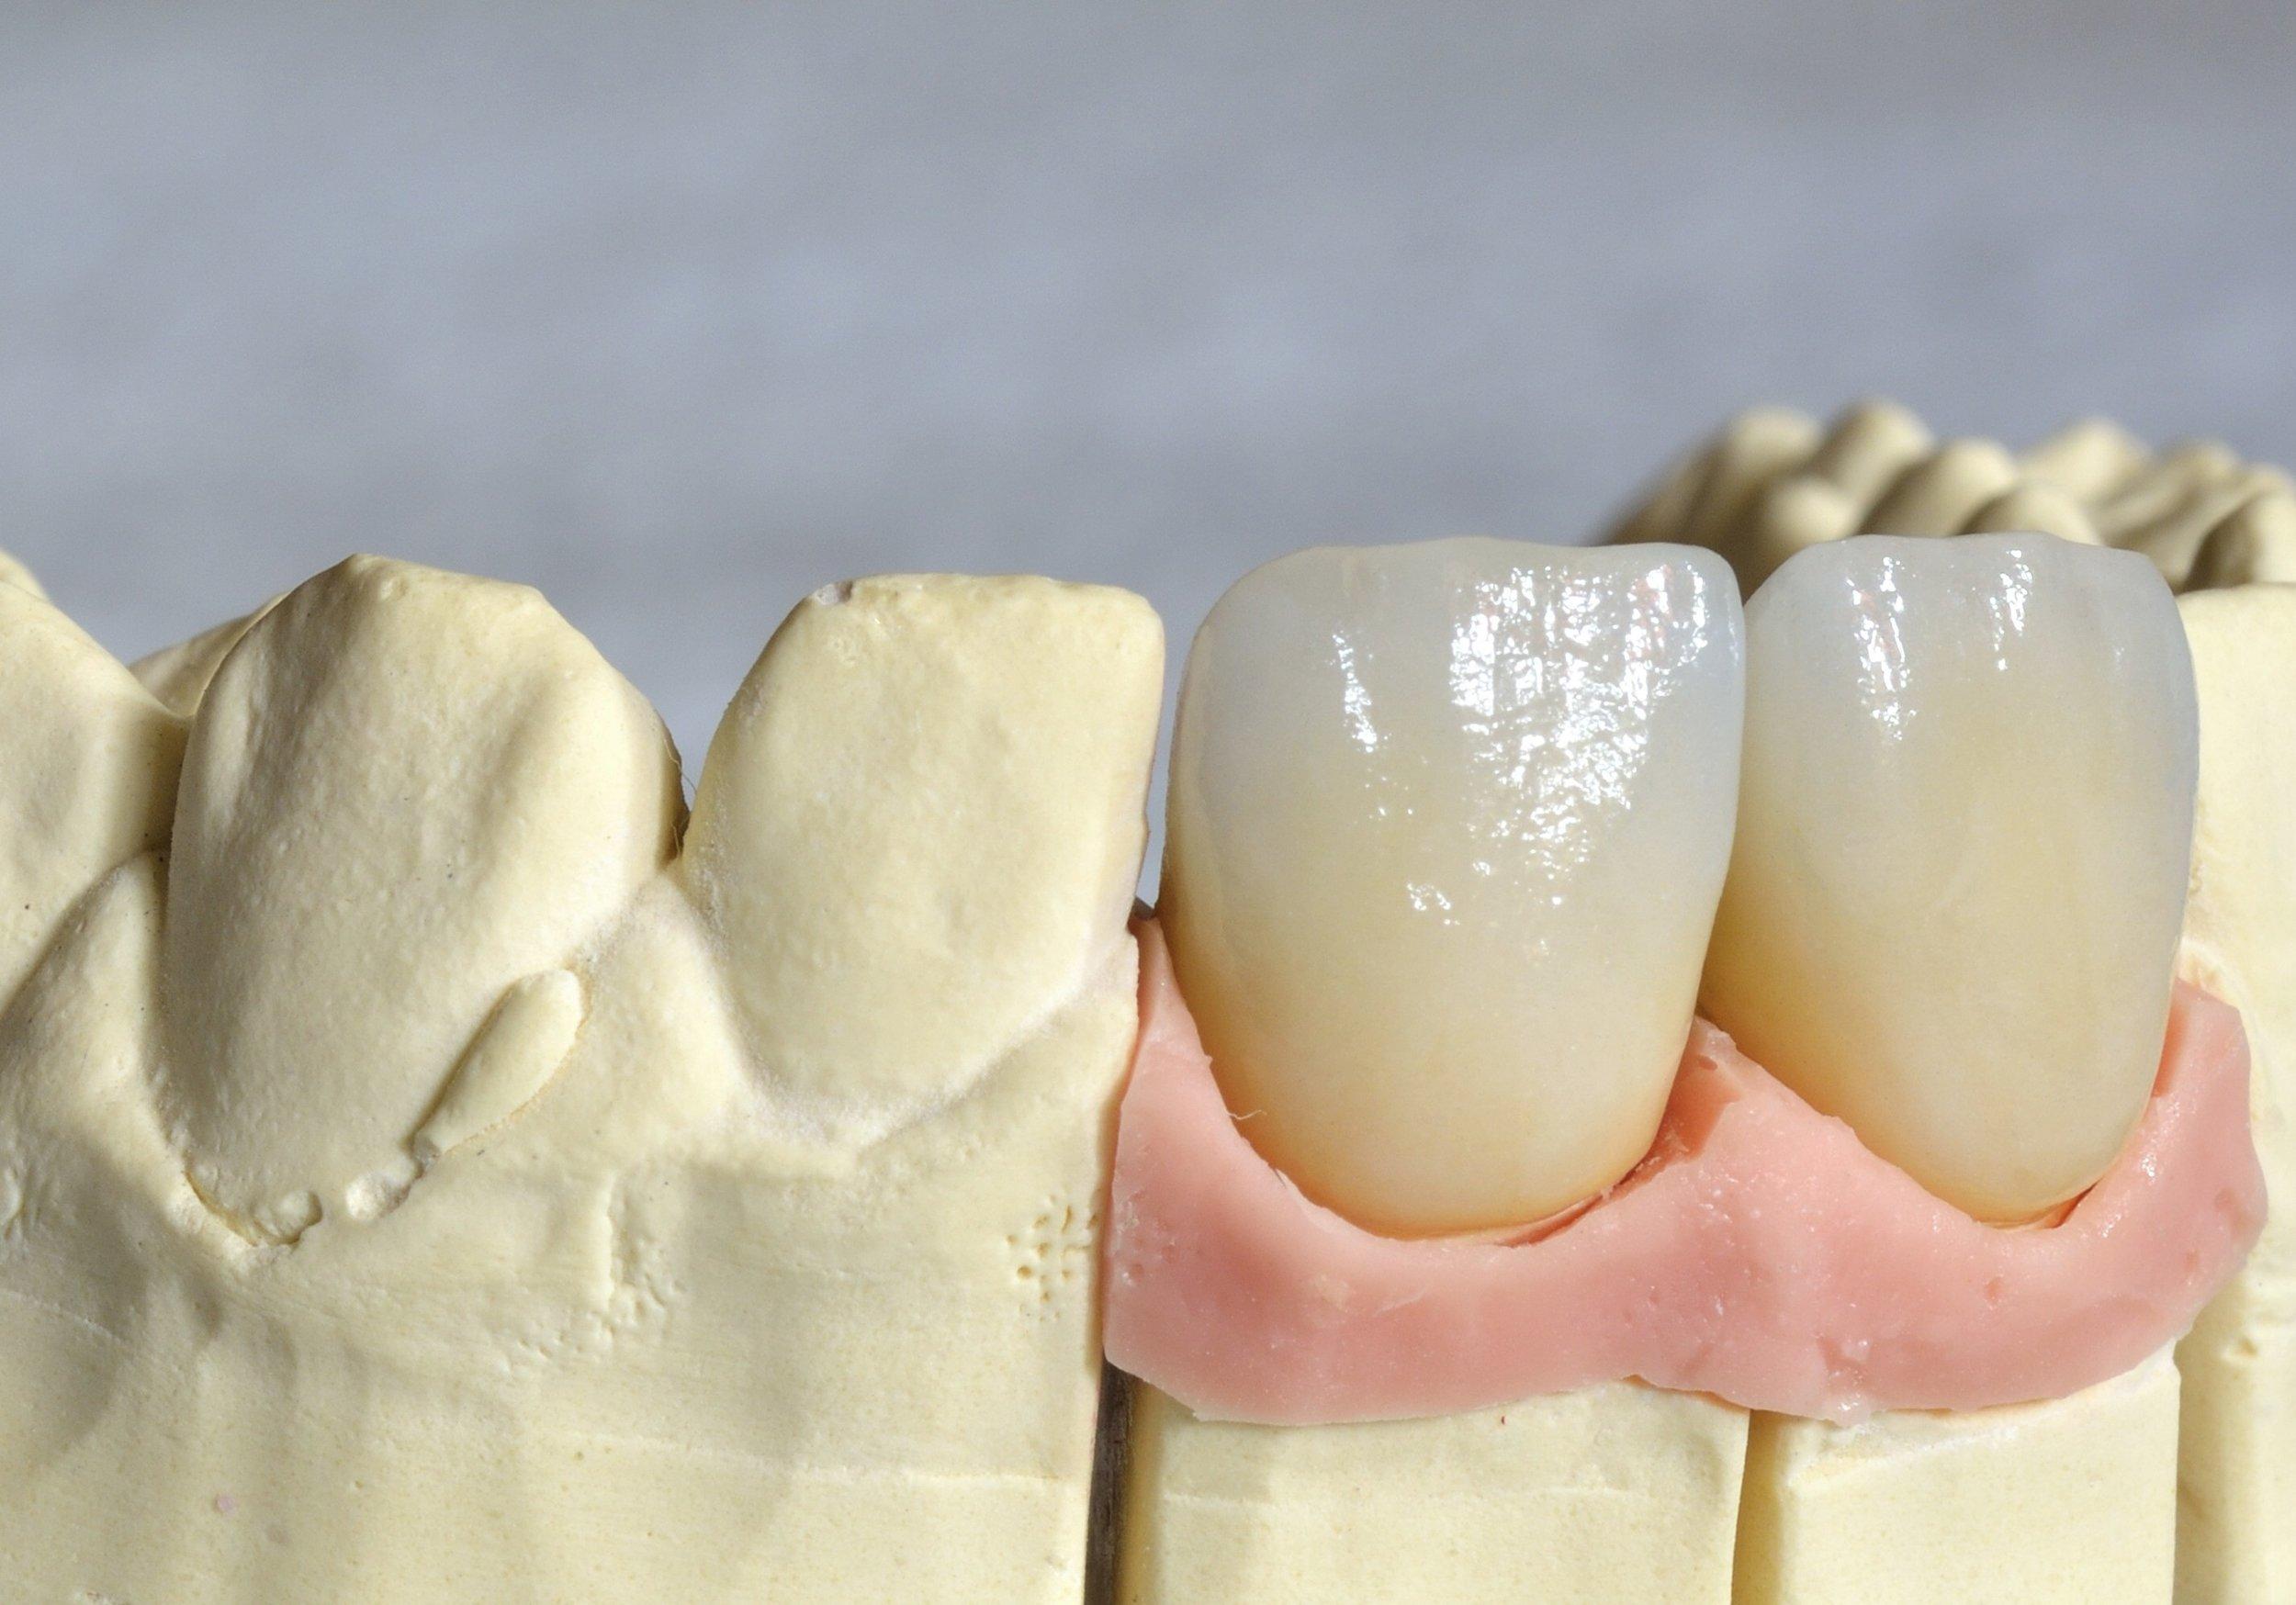 Academy-of-dental-technology-image-of-centrals-landscape.jpg